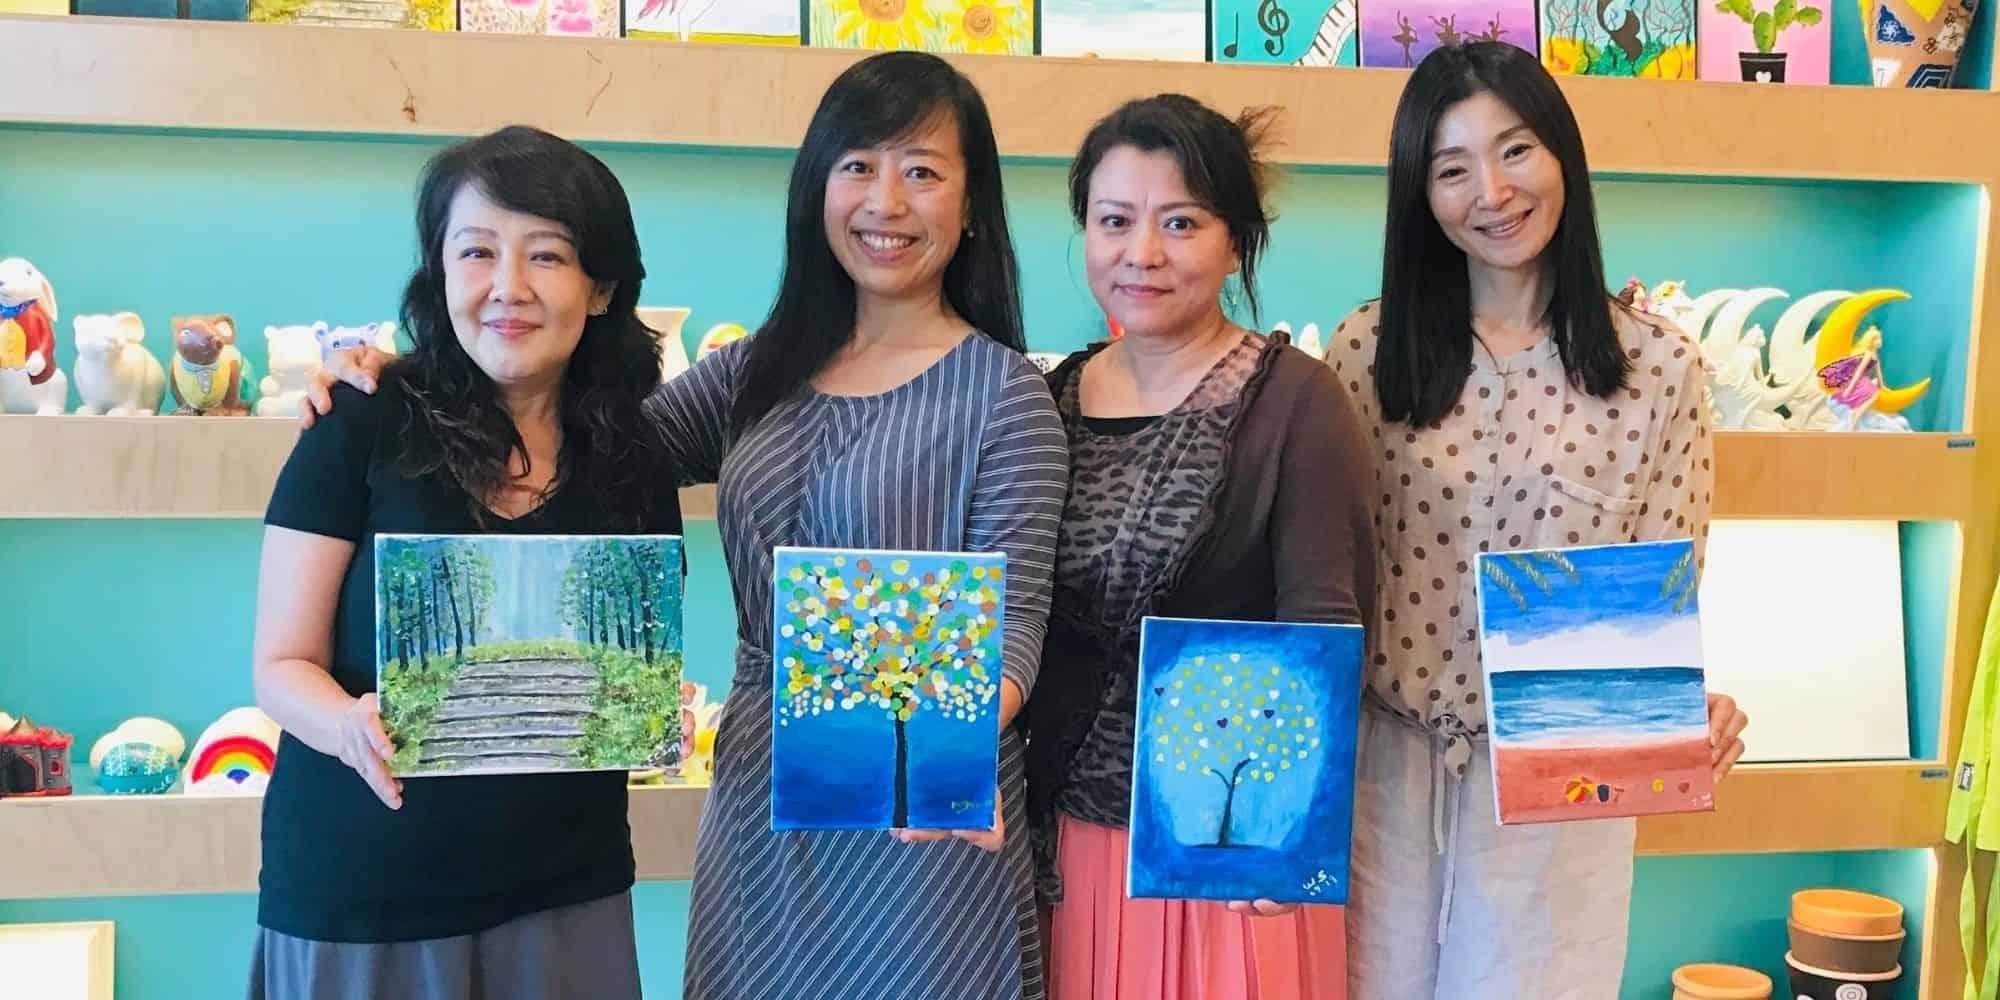 Group Painting Activity Pleasanton California